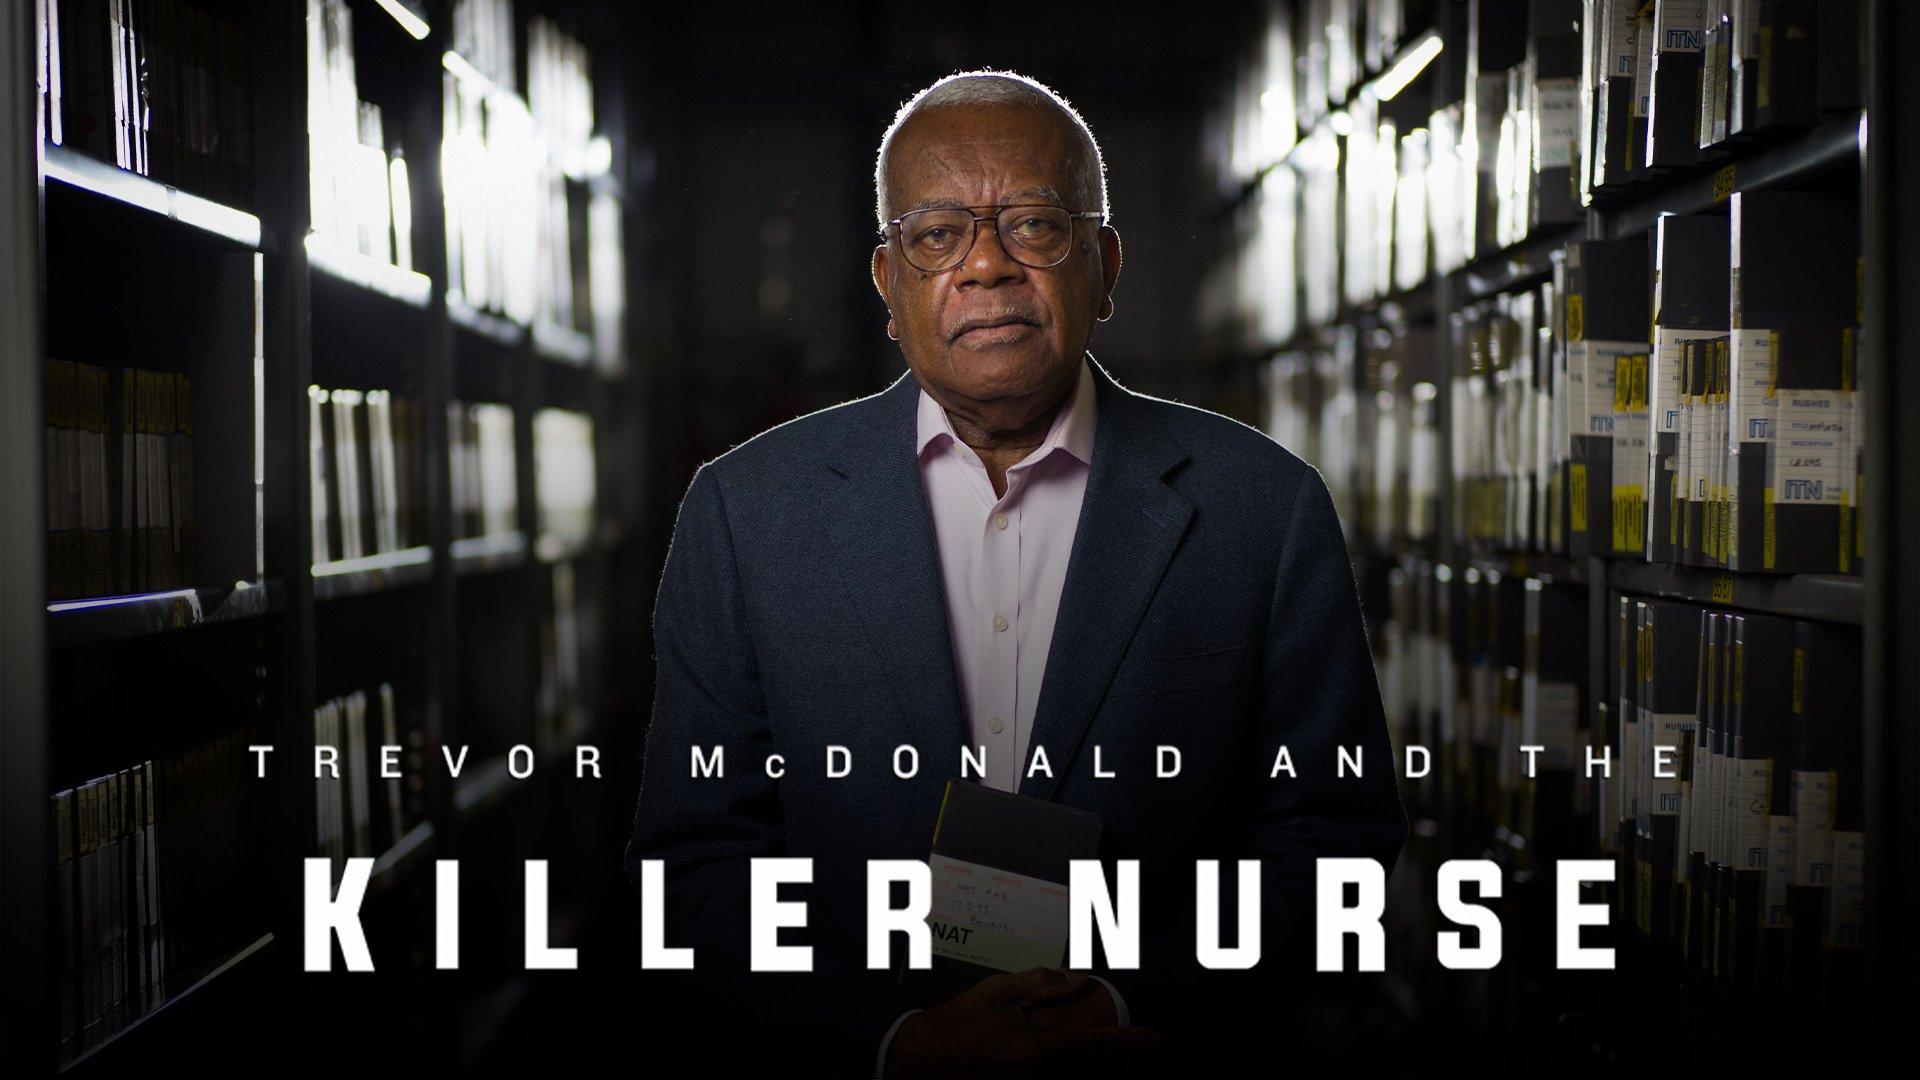 Trevor Mcdonald and the Killer Nurse on BritBox UK